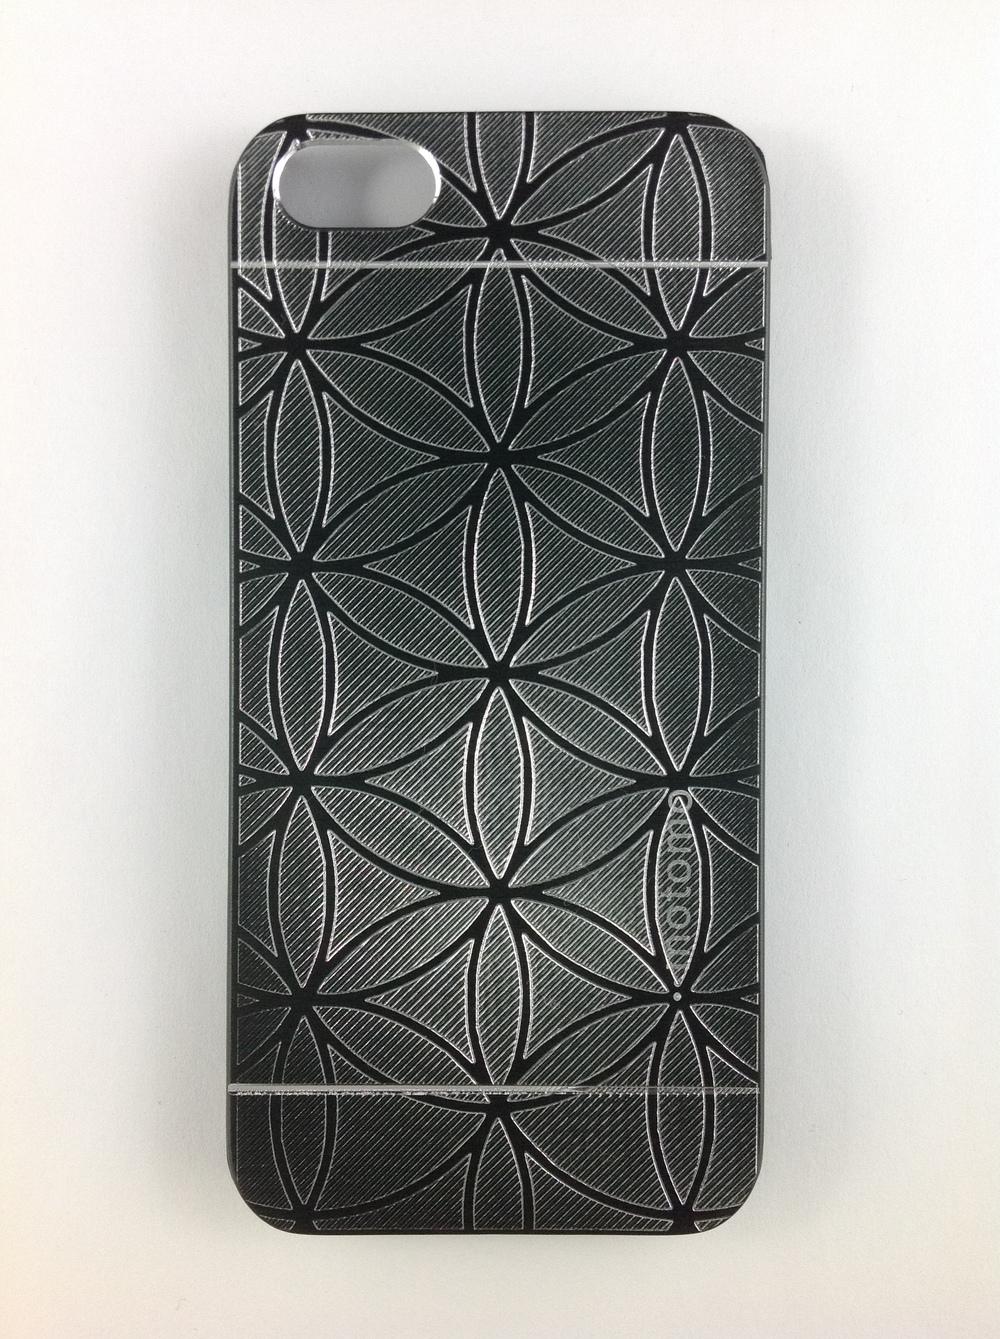 DigitalCarver-iPhone5s-IMG_3690.JPG